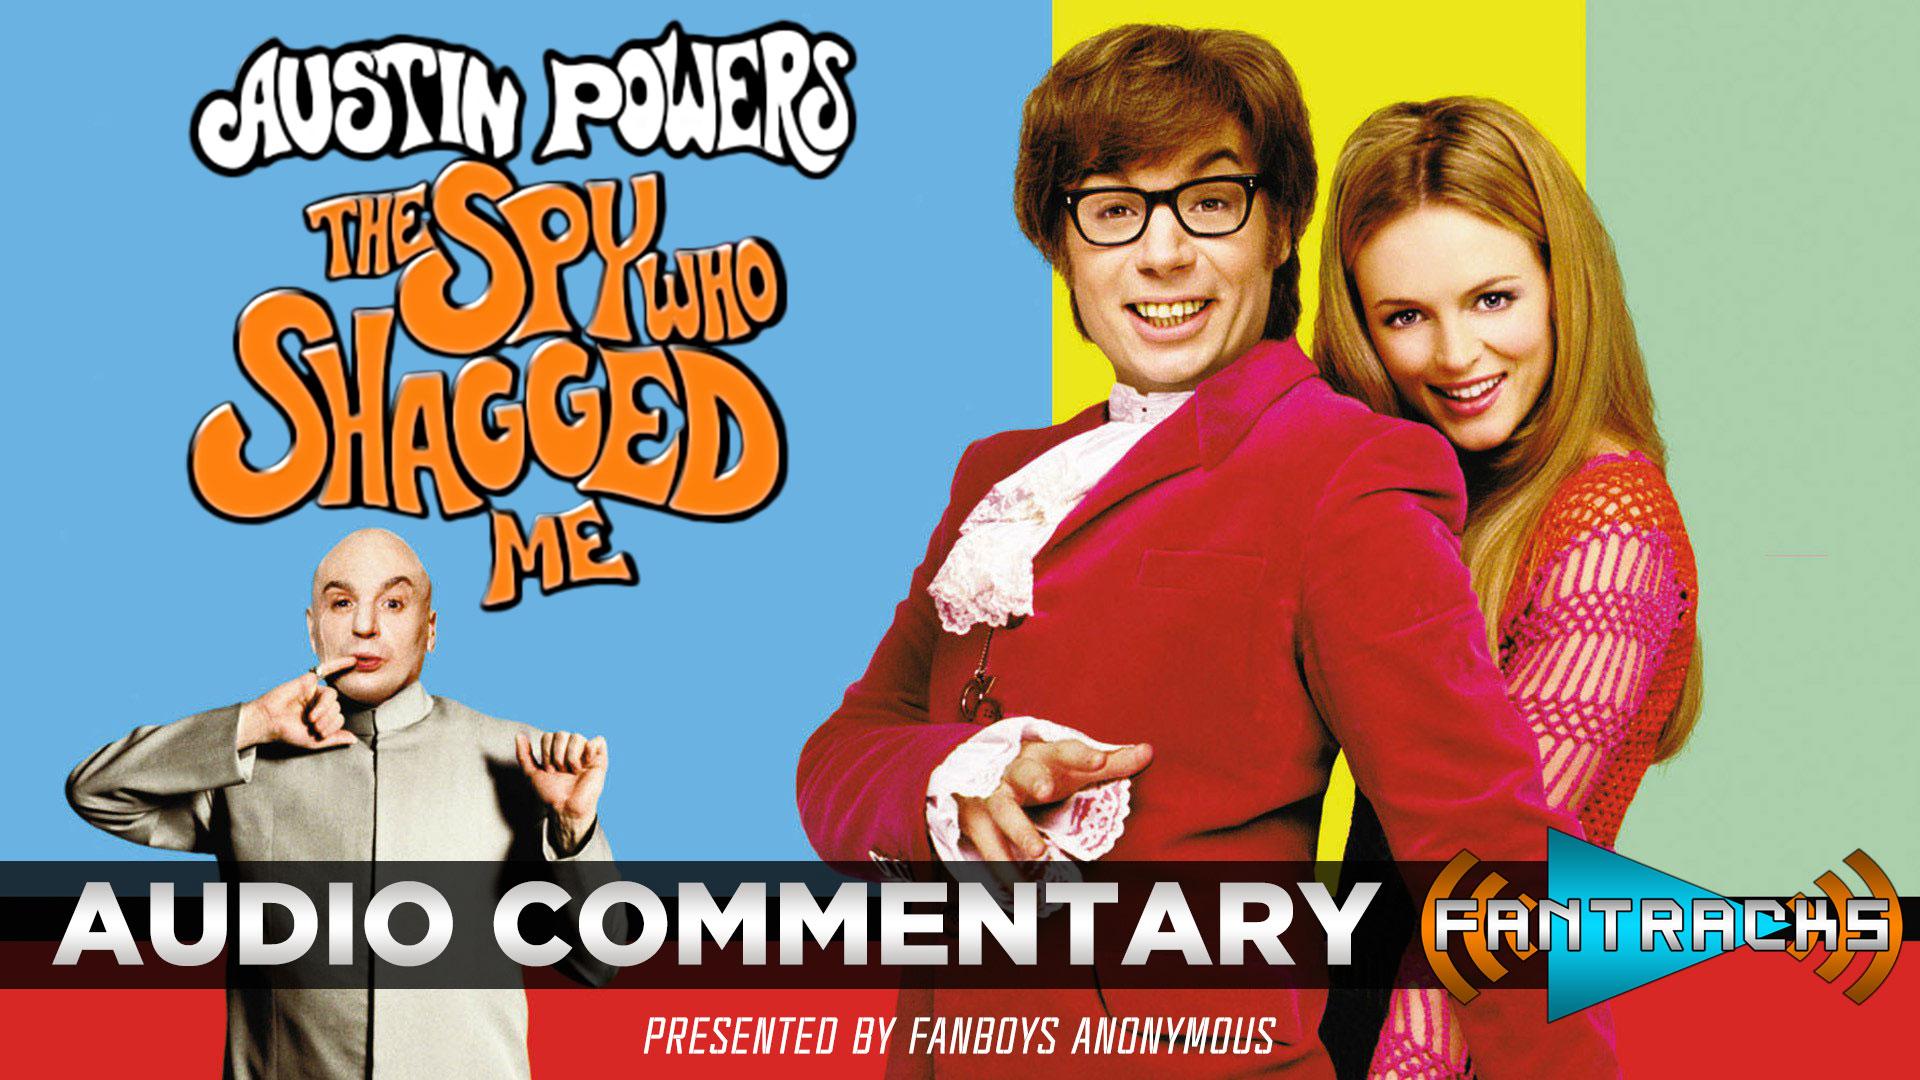 FanTracks Austin Powers: The Spy Who Shagged Me audio commentary